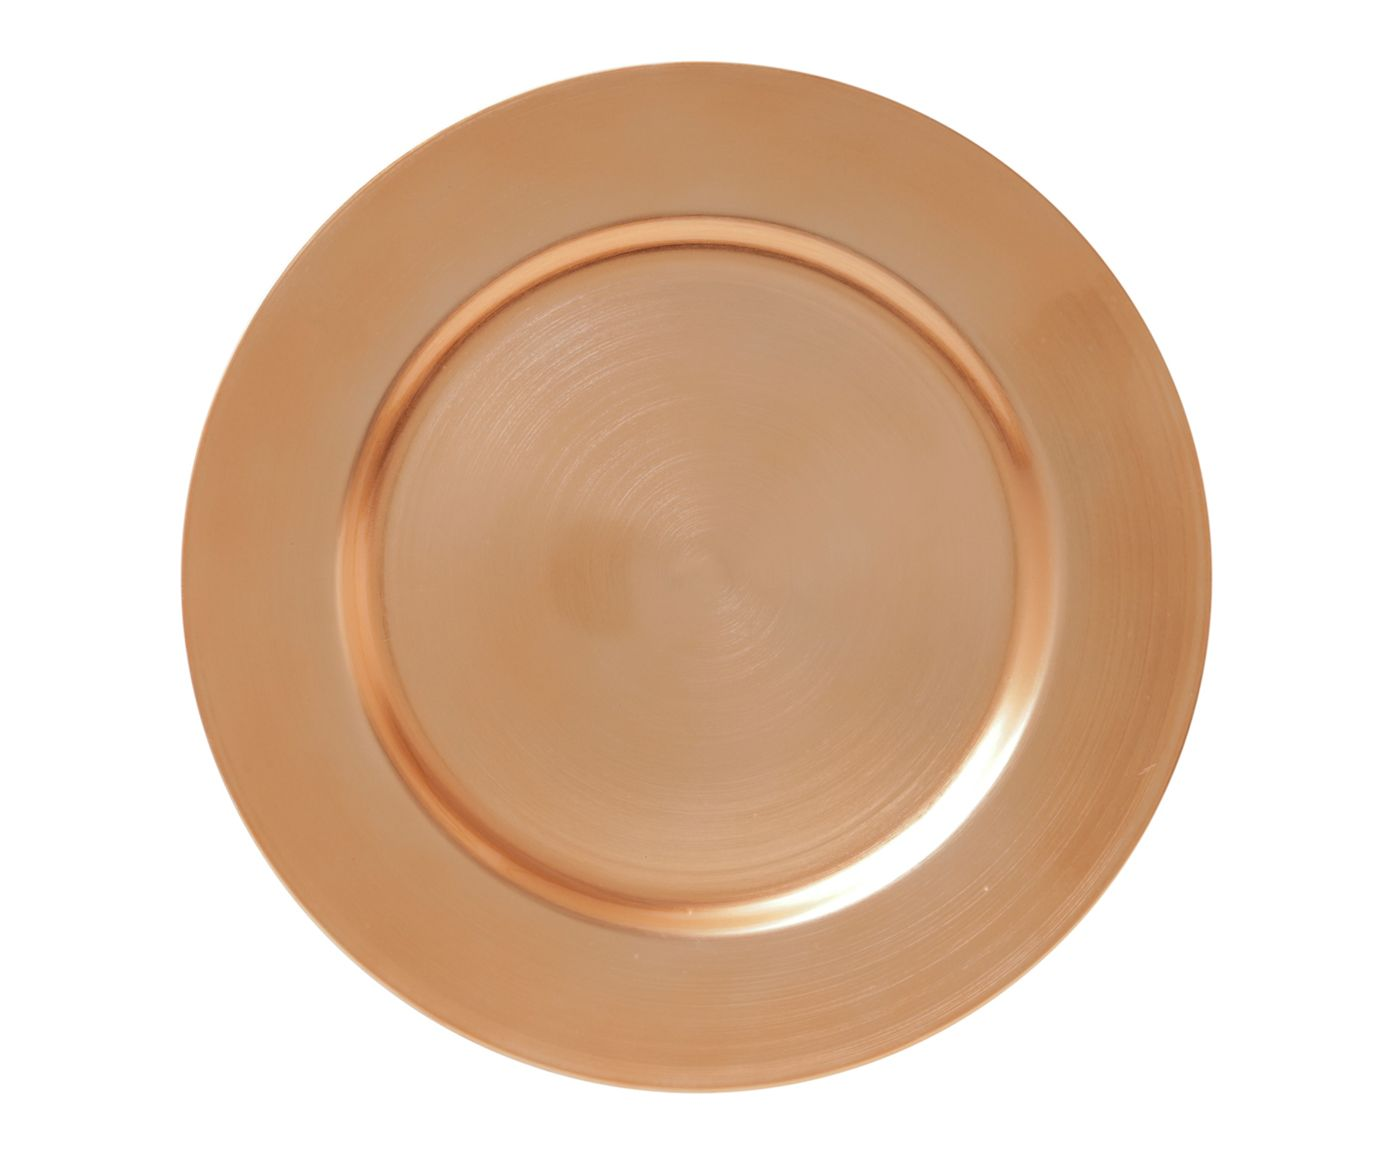 Sousplat Opala Dourado - 33cm   Westwing.com.br